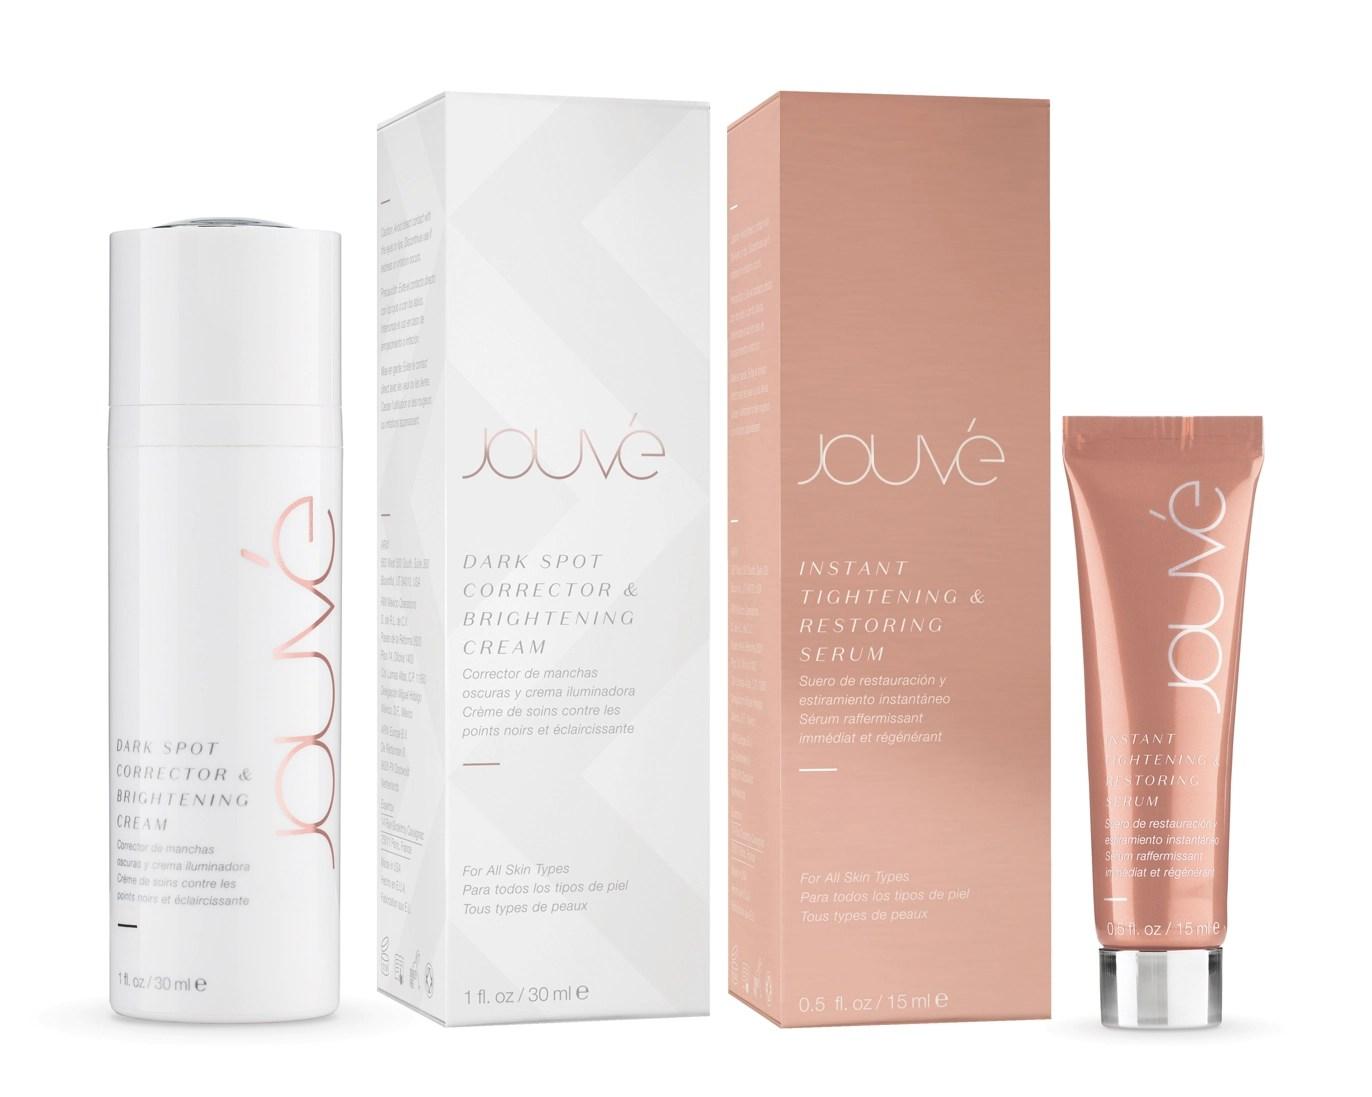 Dark spot corrector reviews by dermatologist - Review Jouve Instant Tightening Serum And Jouve Dark Spot Corrector